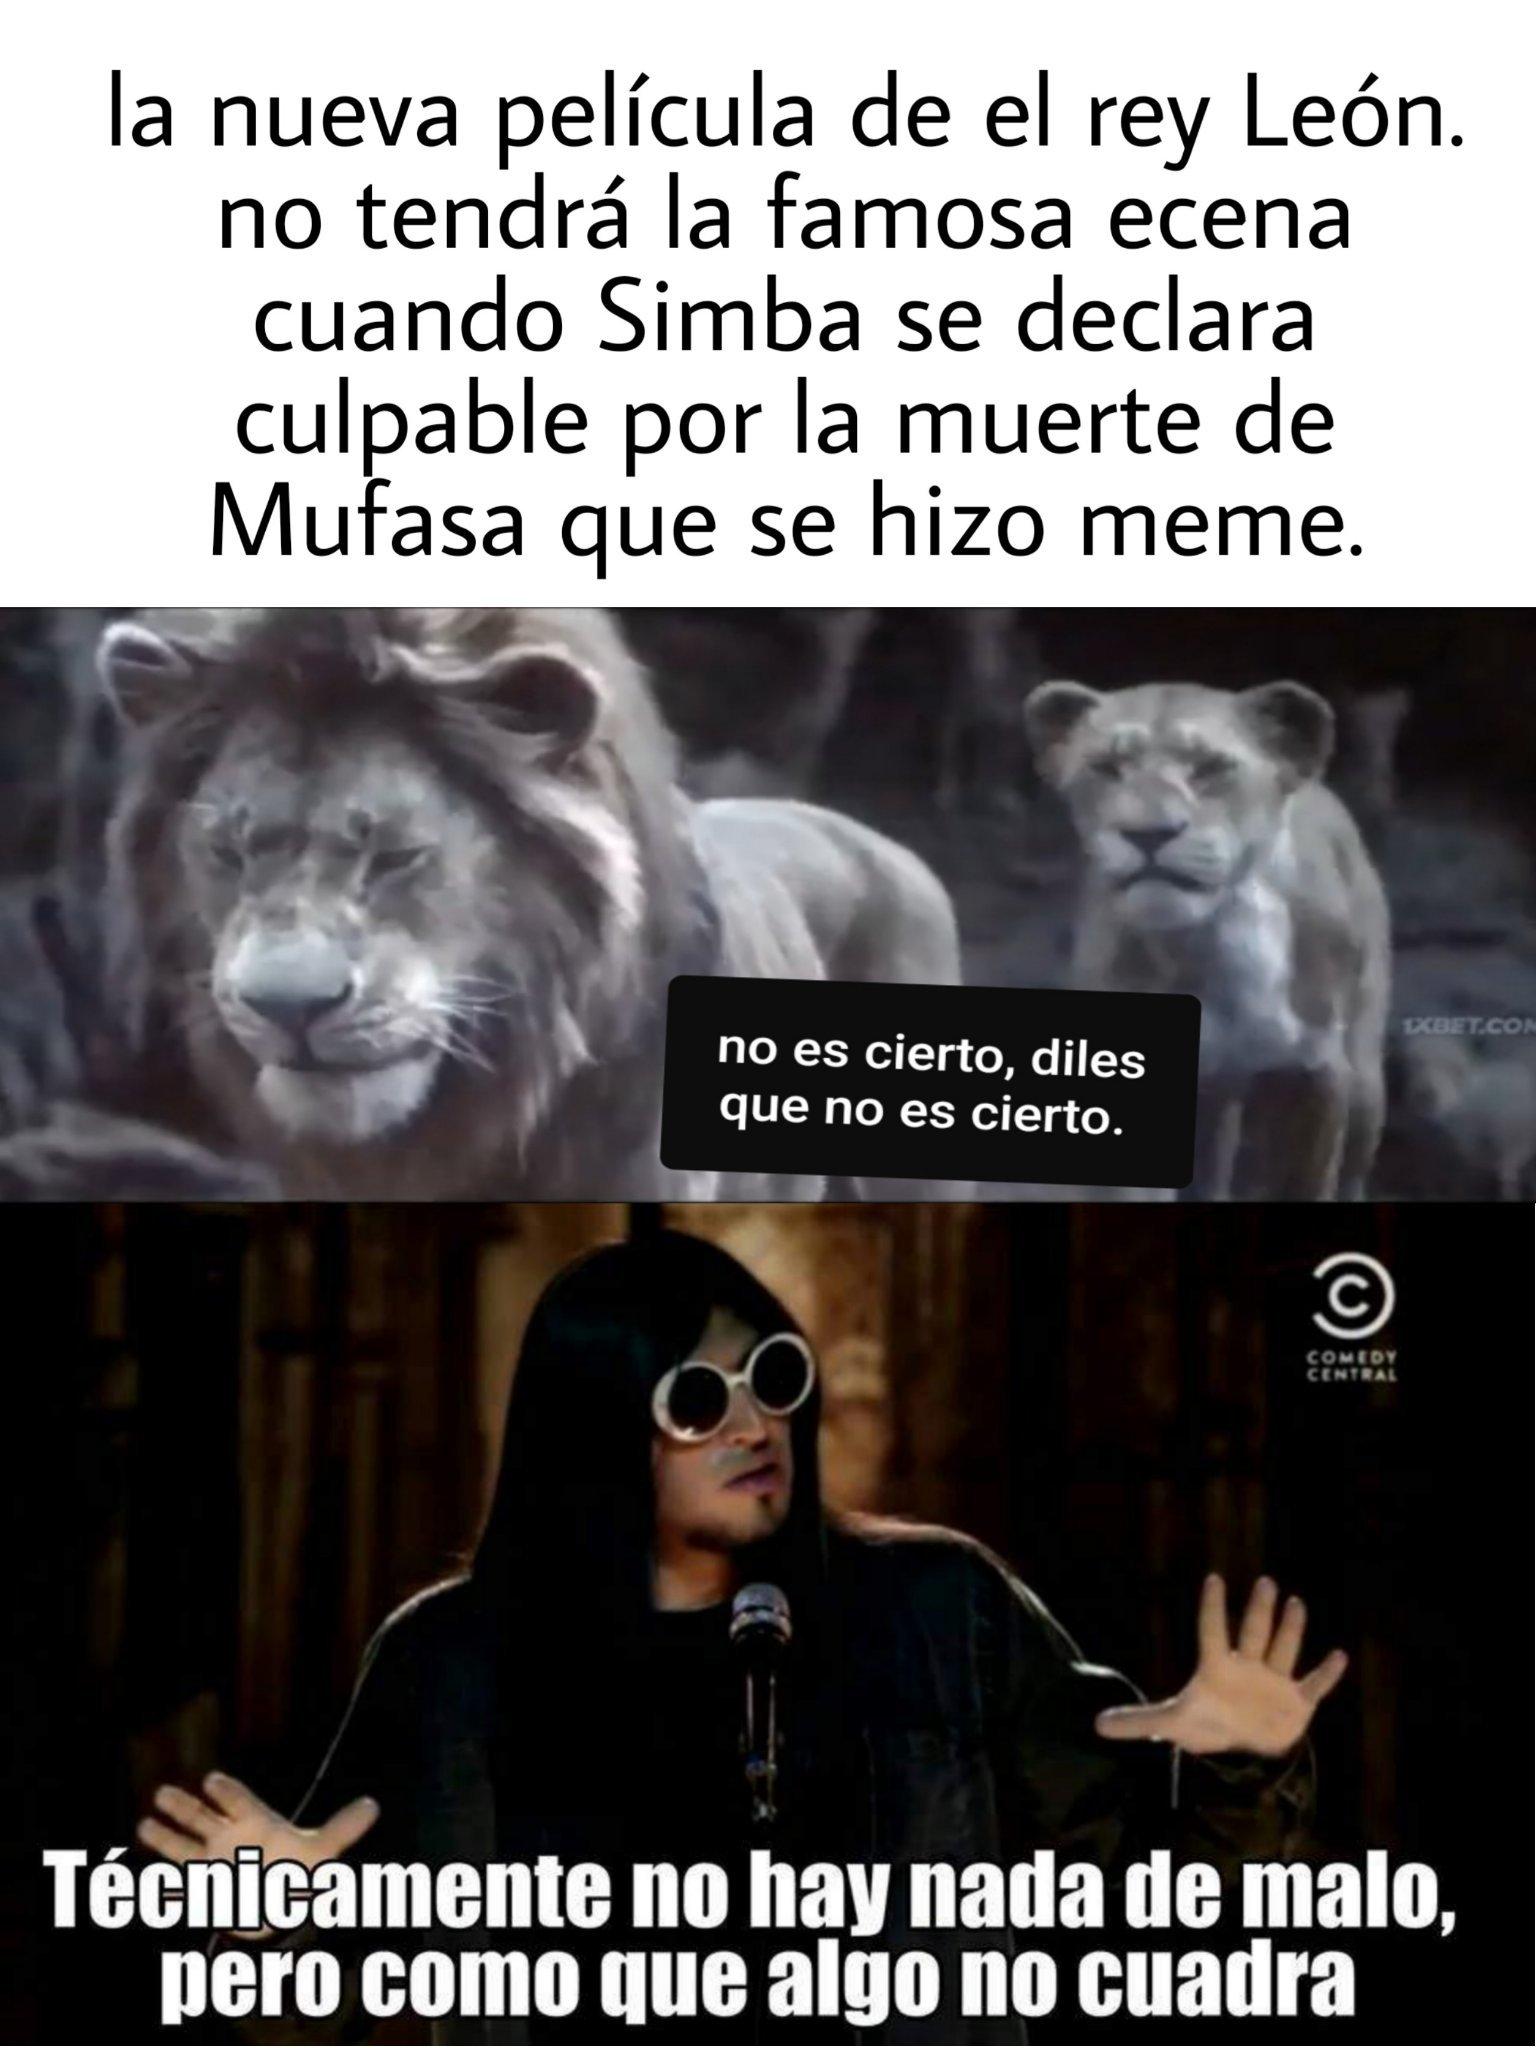 What!! - meme